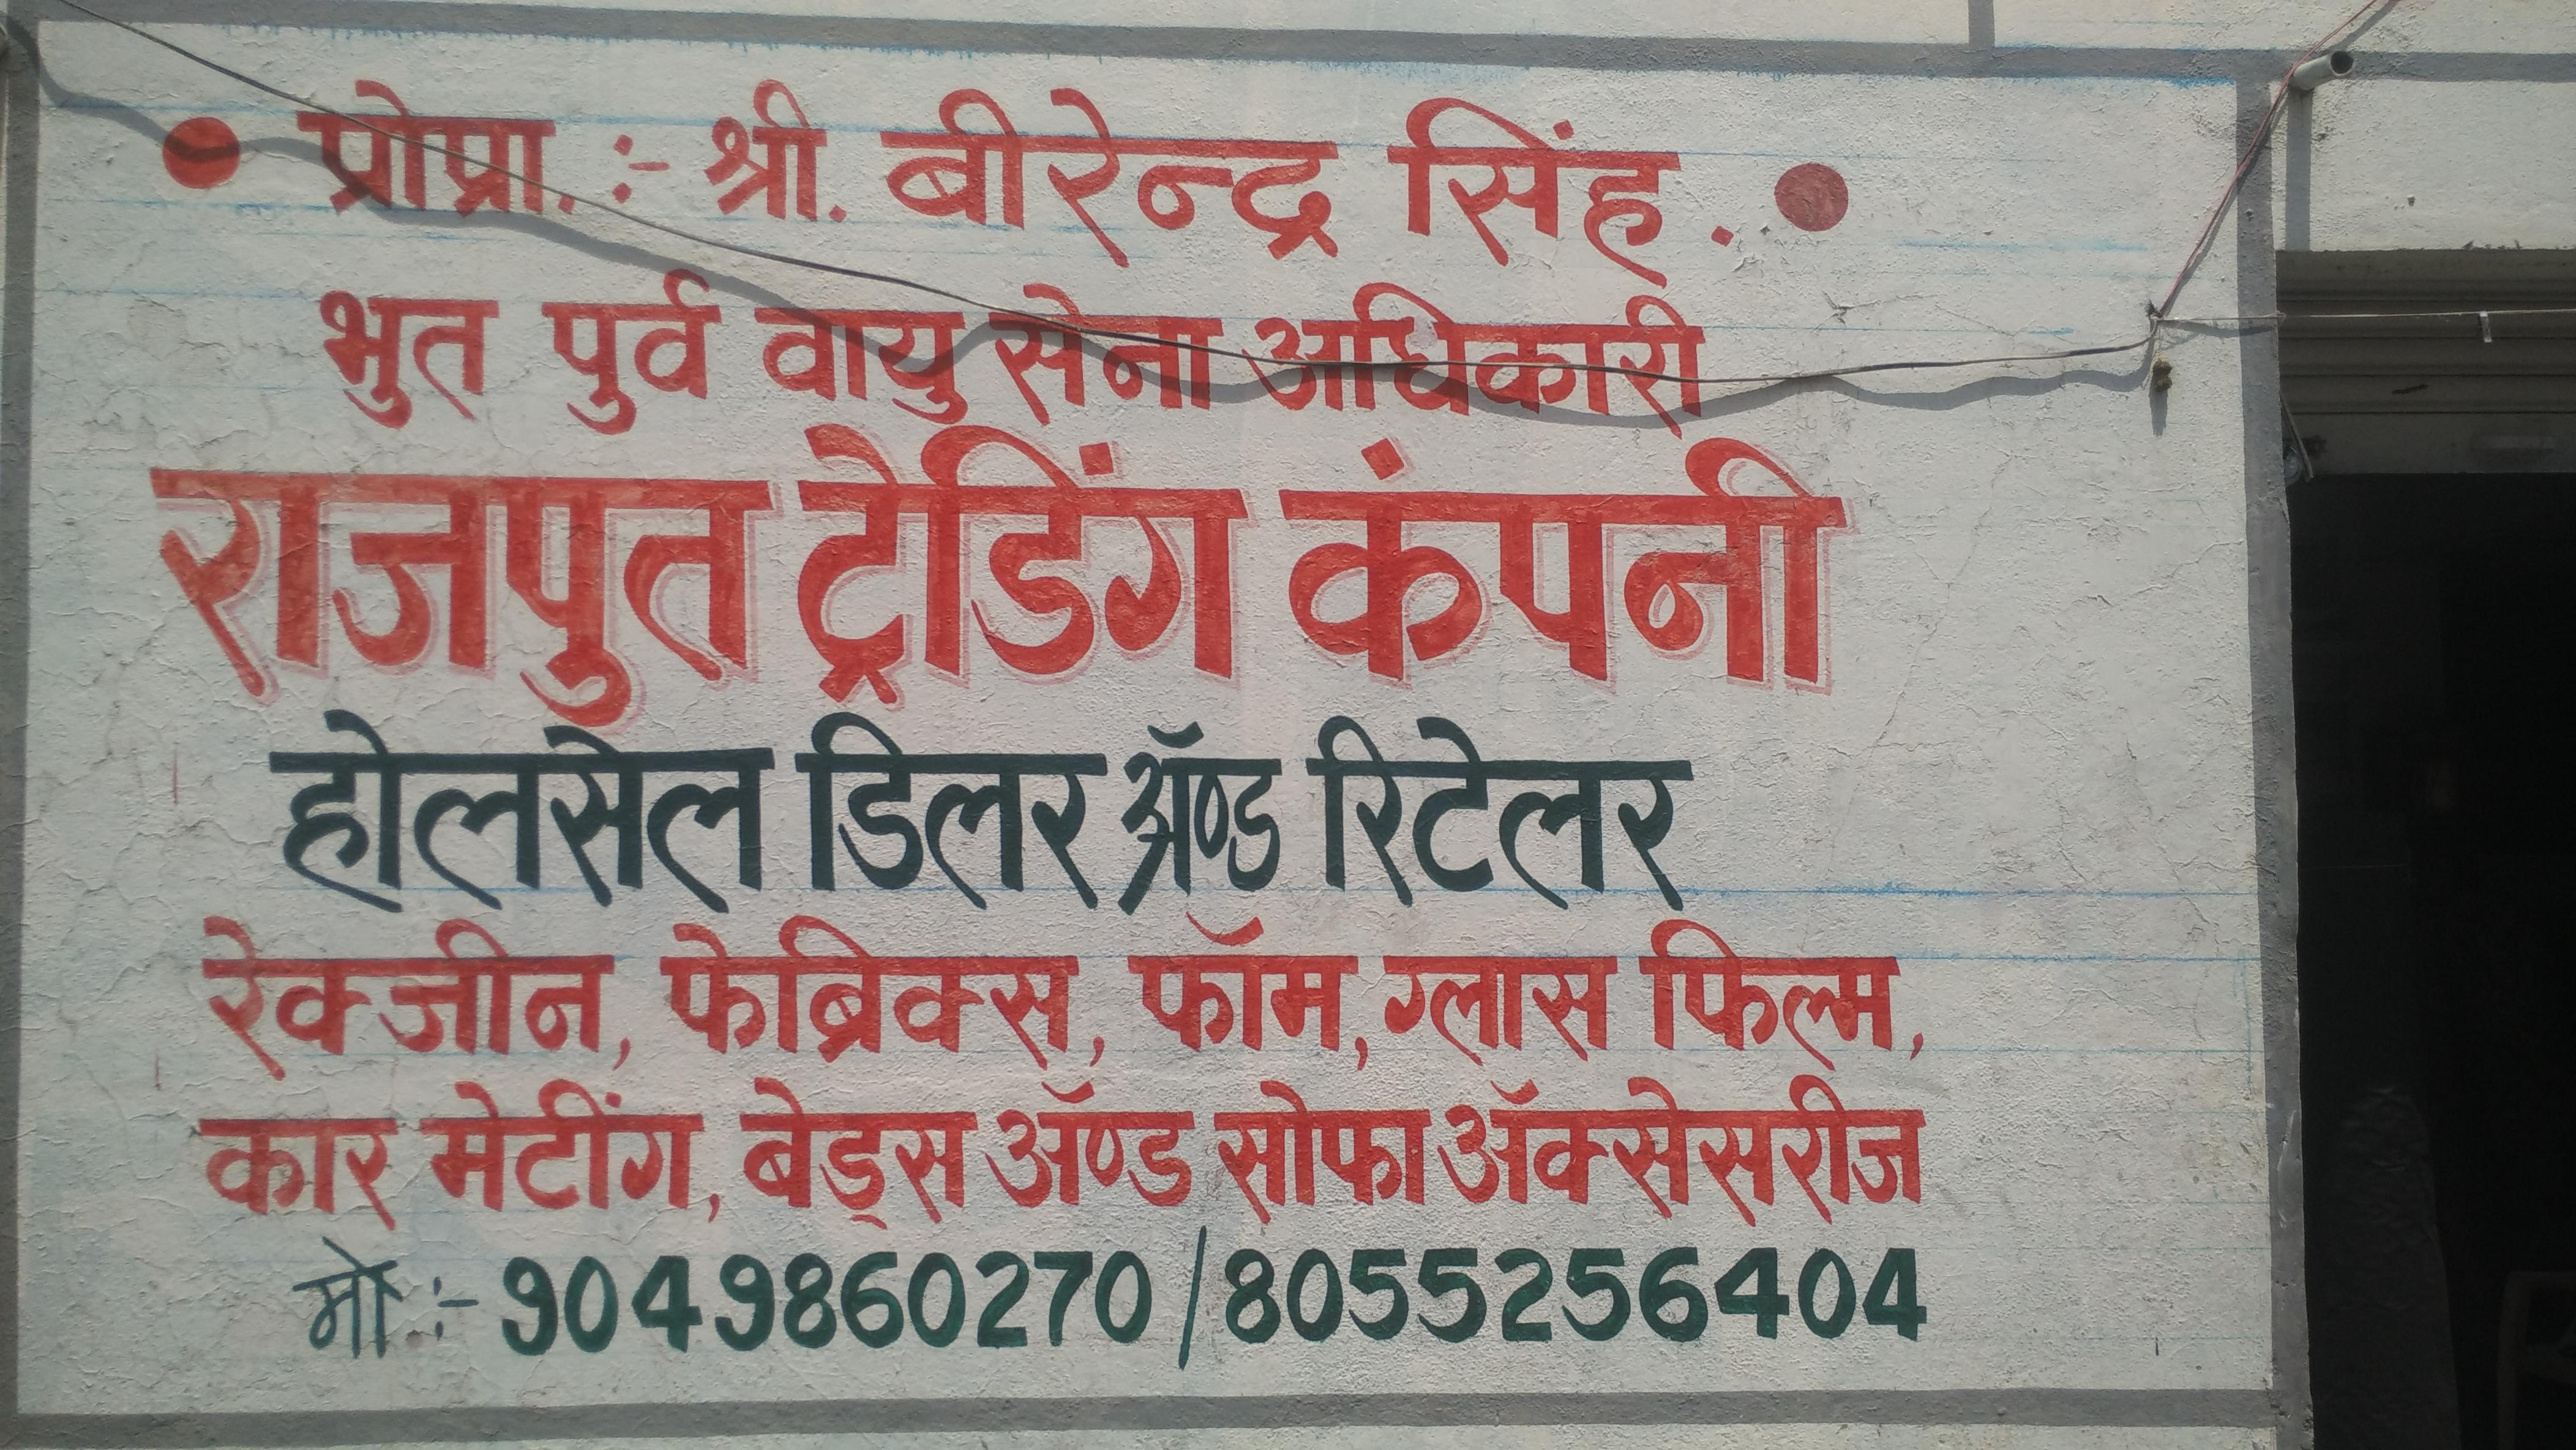 Rajput Trading Company